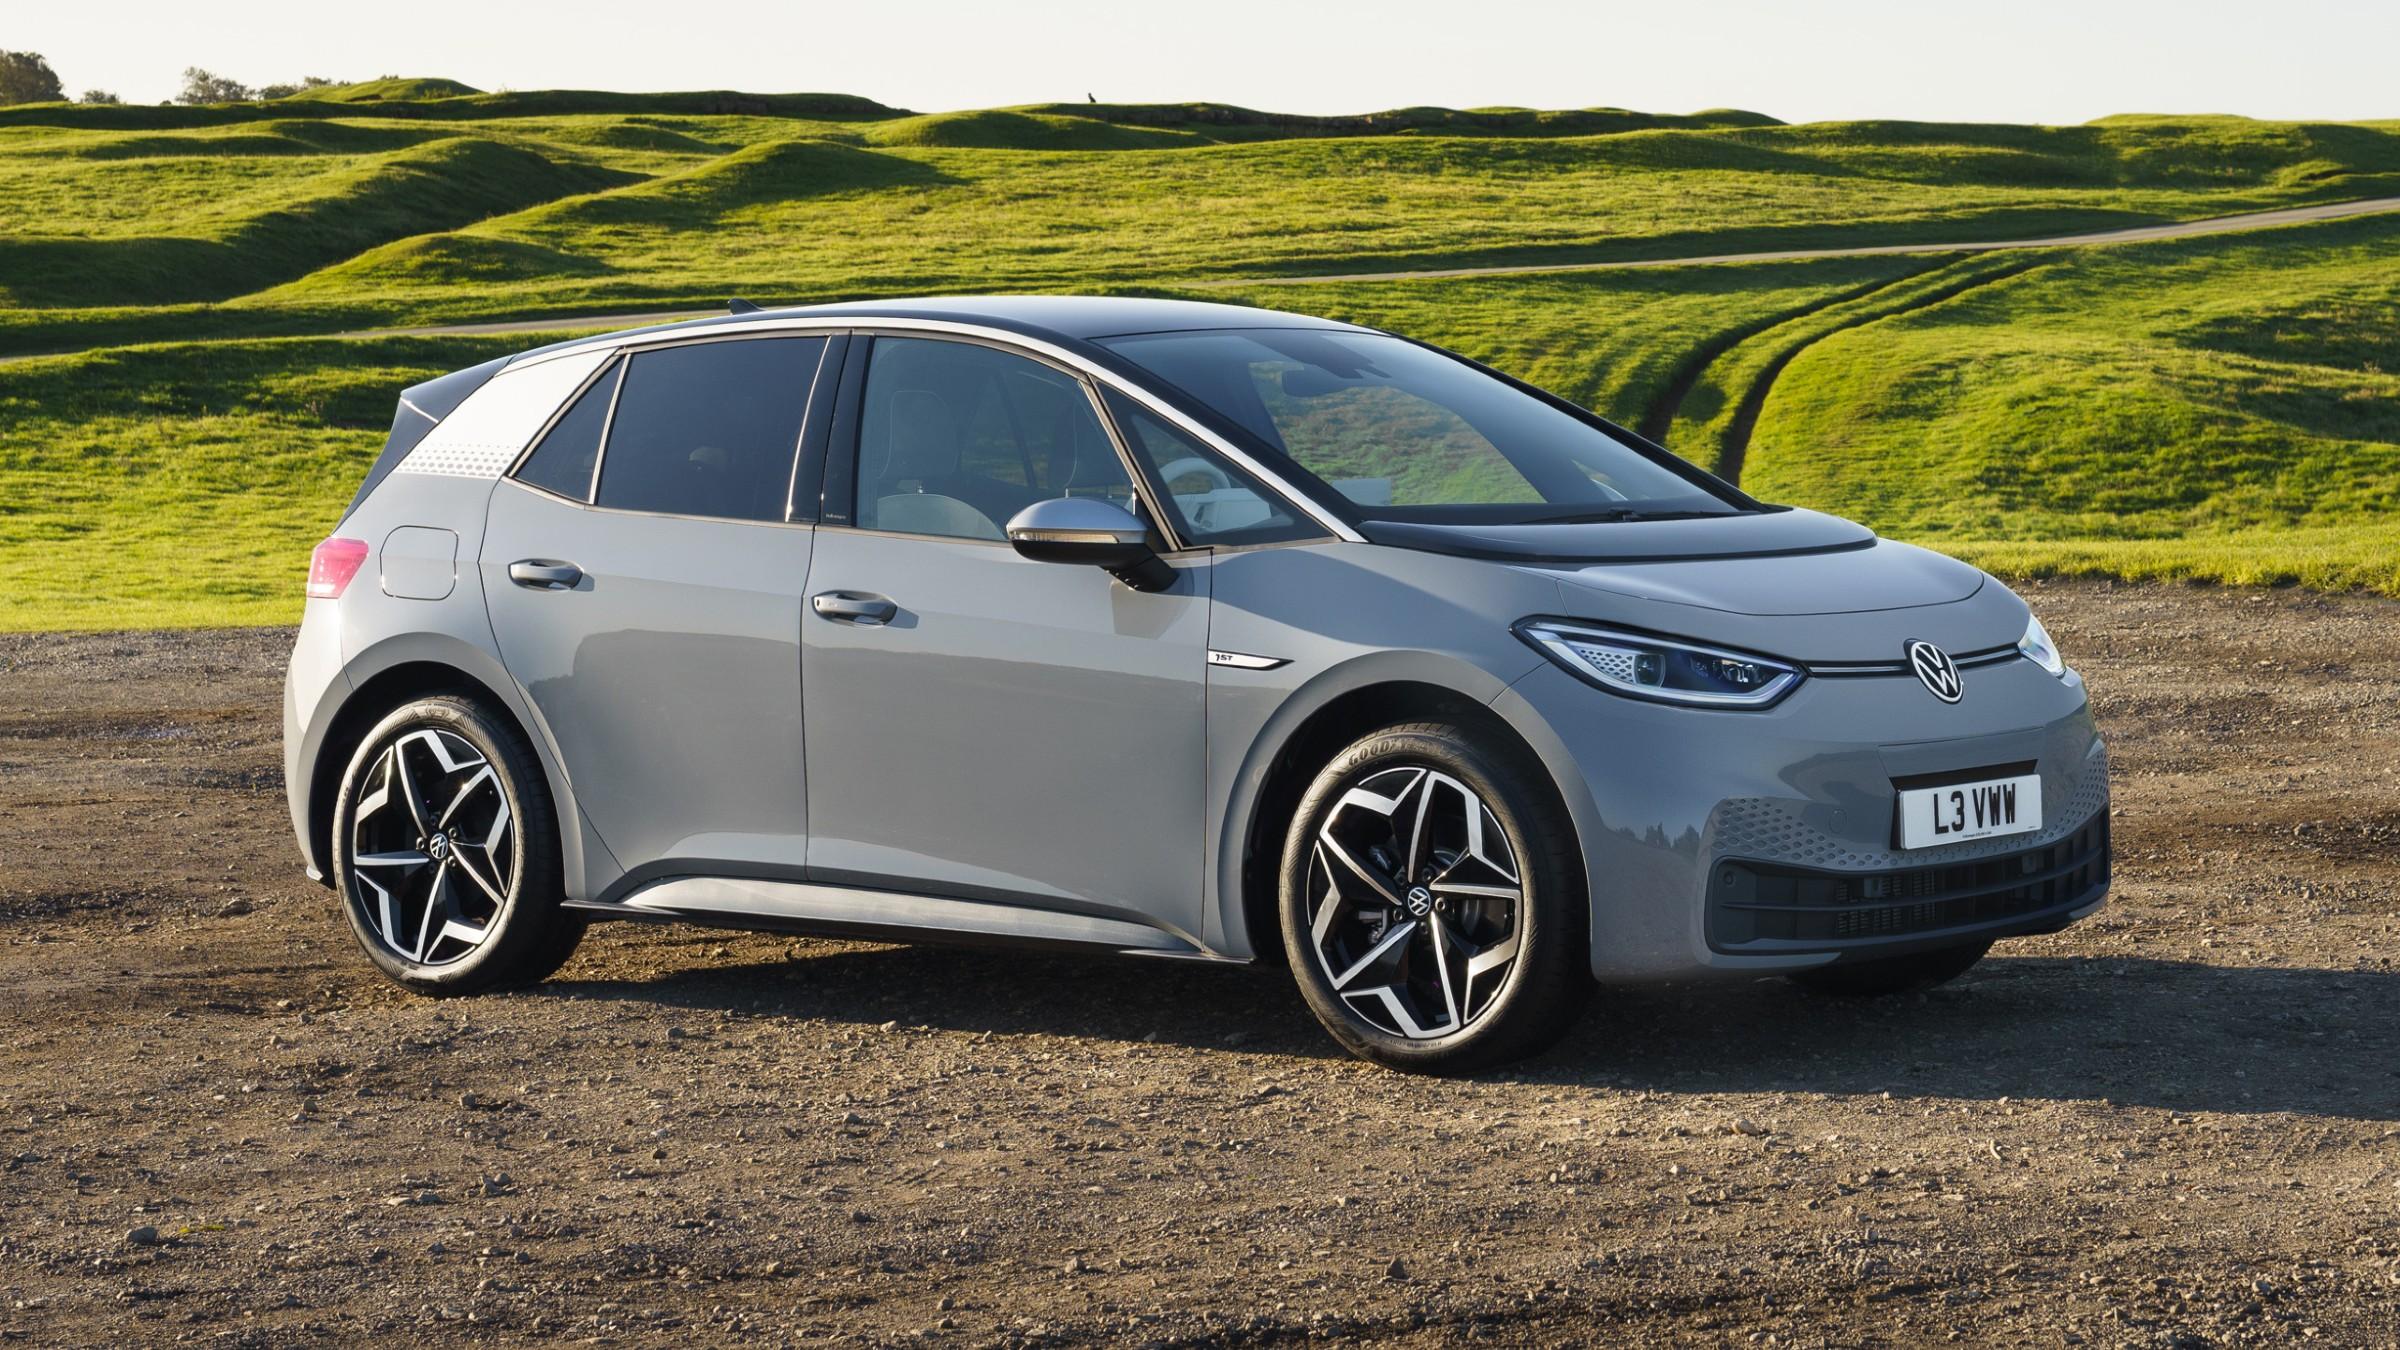 Volkswagen: Τριπλασίασε τις πωλήσεις ηλεκτρικών αυτοκινήτων το 2020